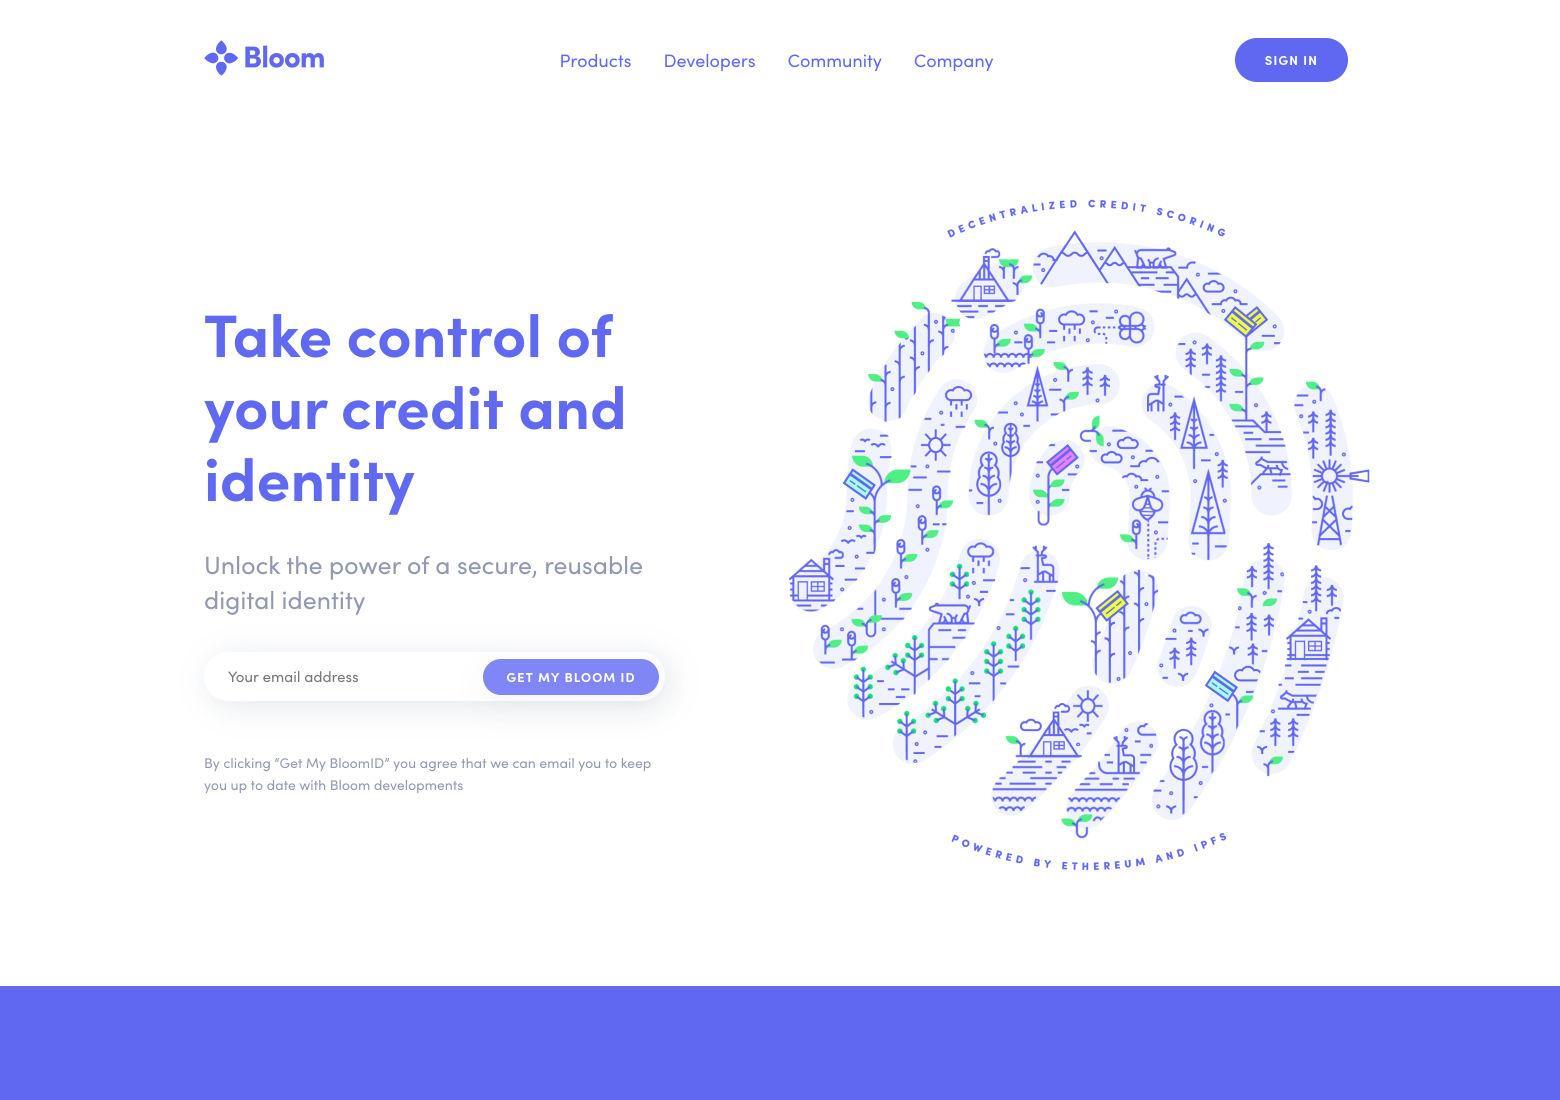 Basic website layout: split screen